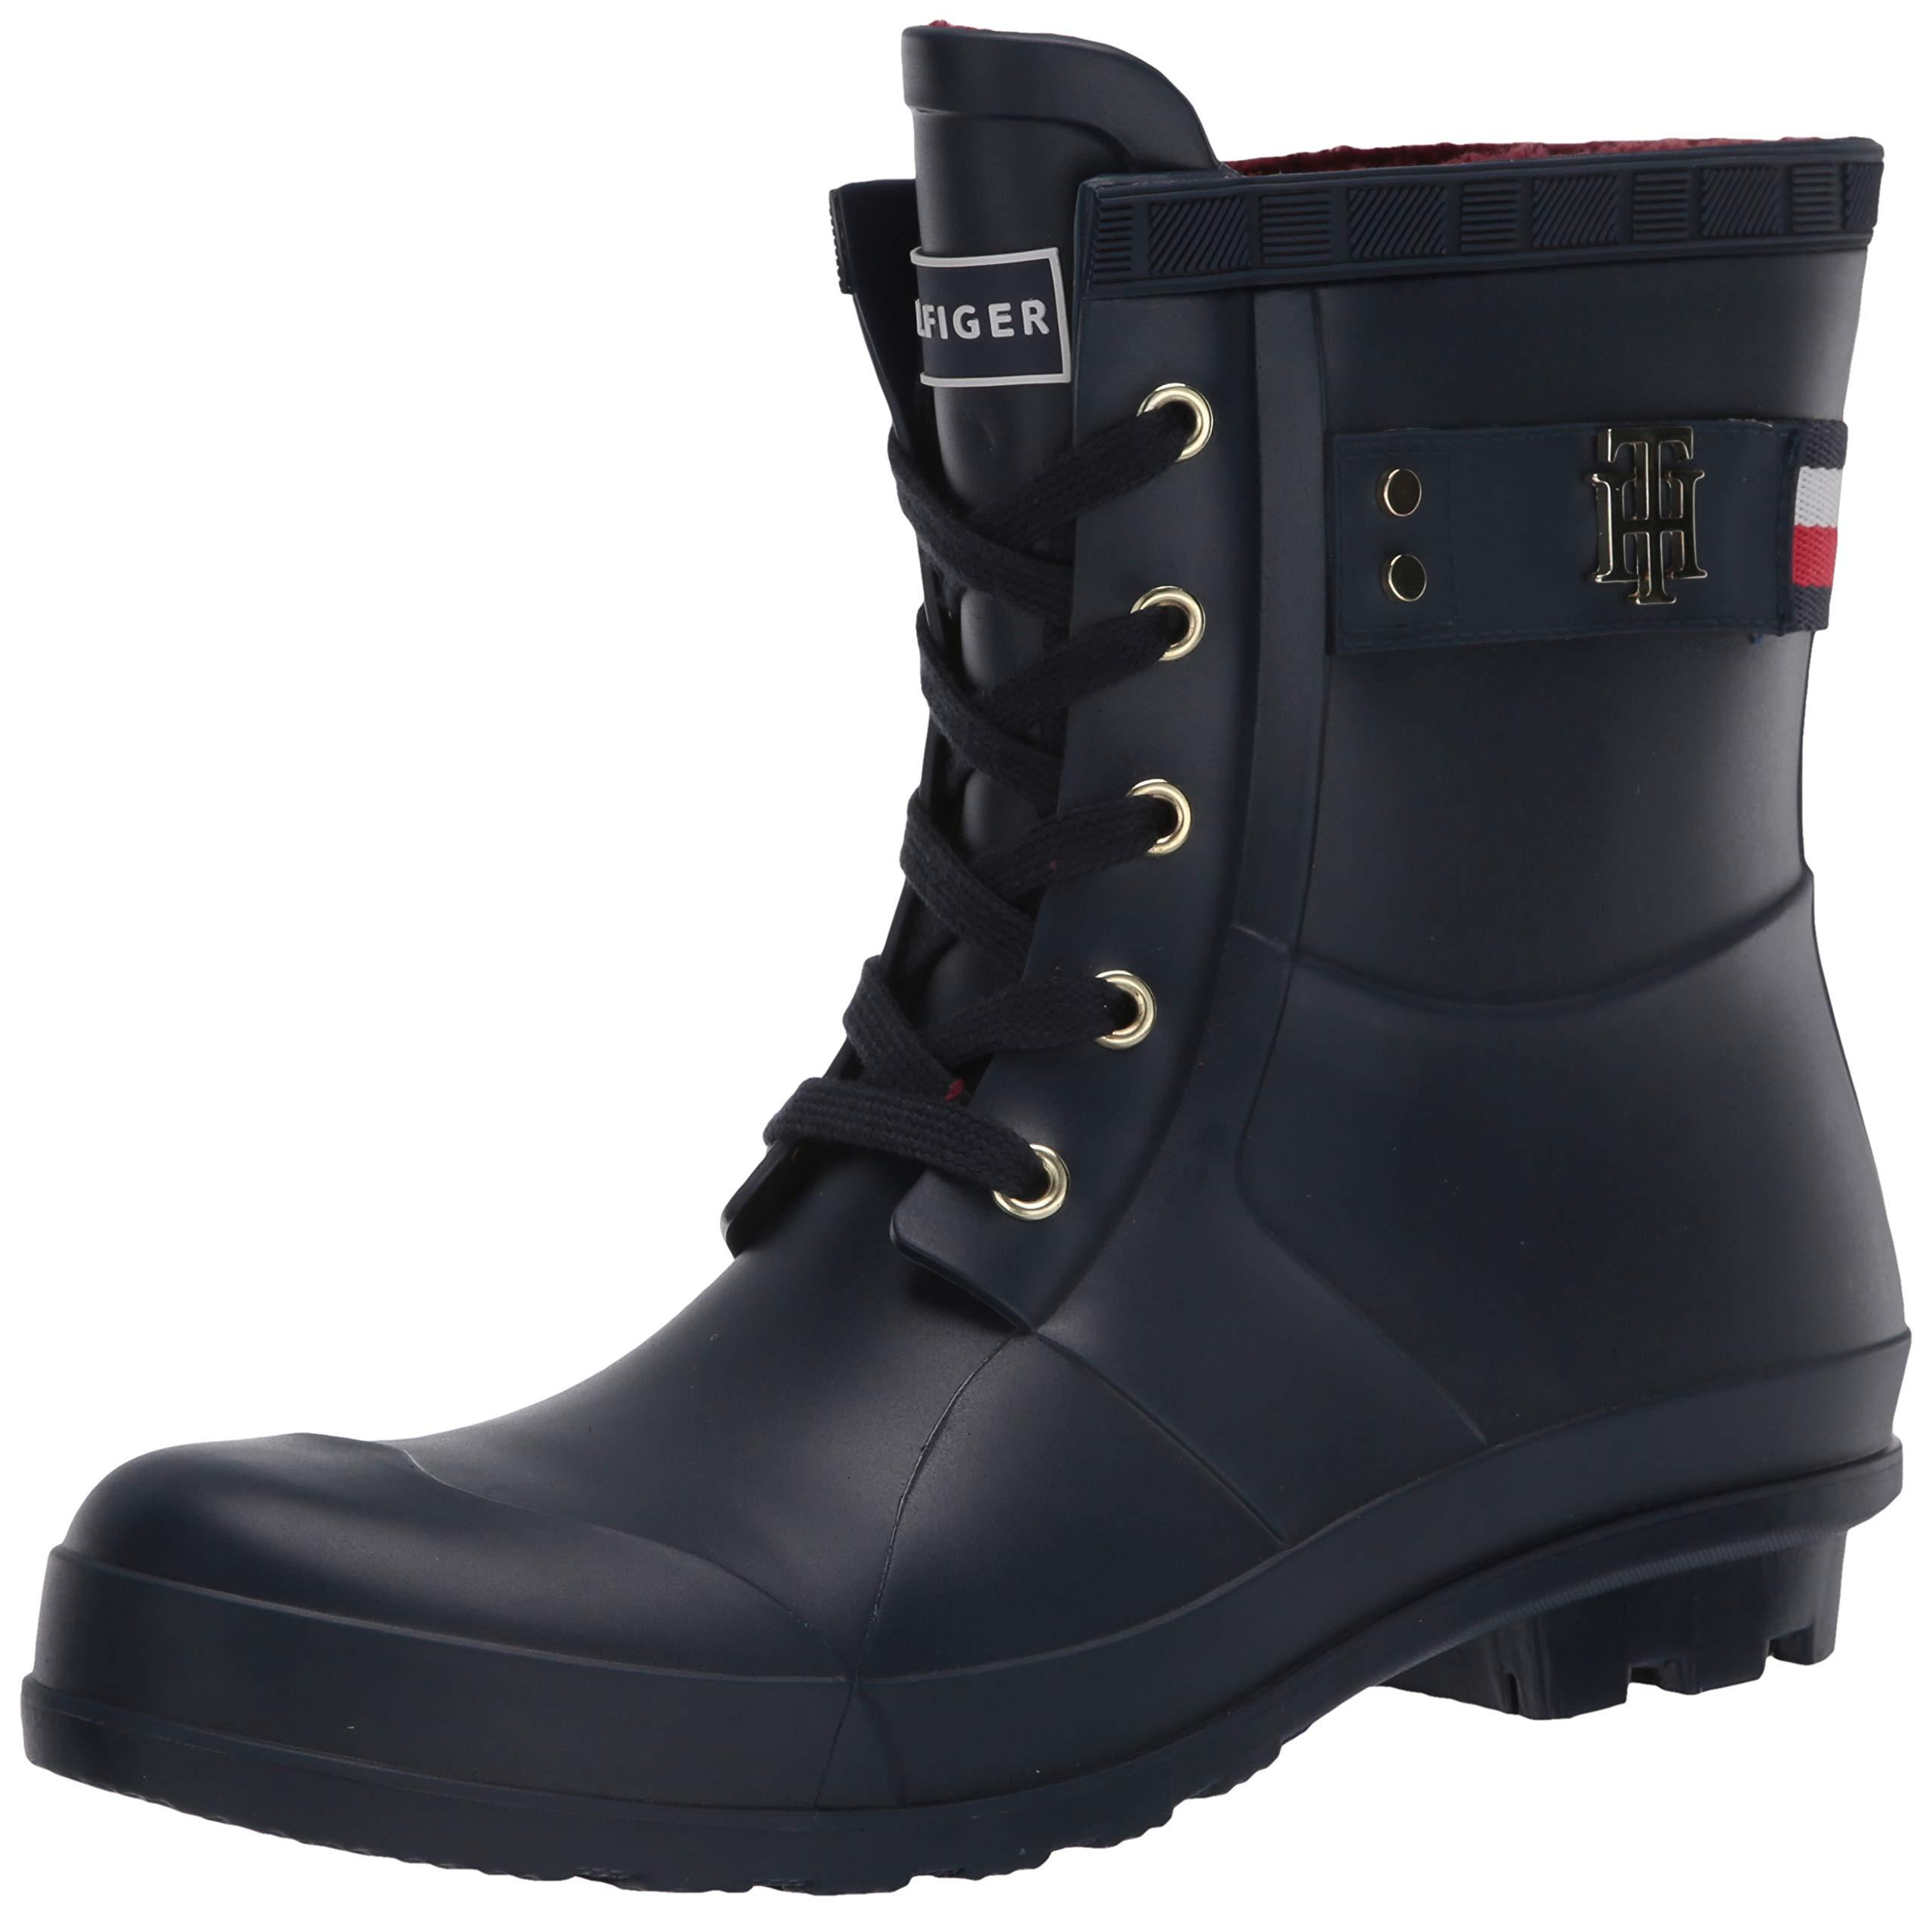 Tommy Hilfiger Toniee Rain Boot In Navy Blue - Lyst-7655